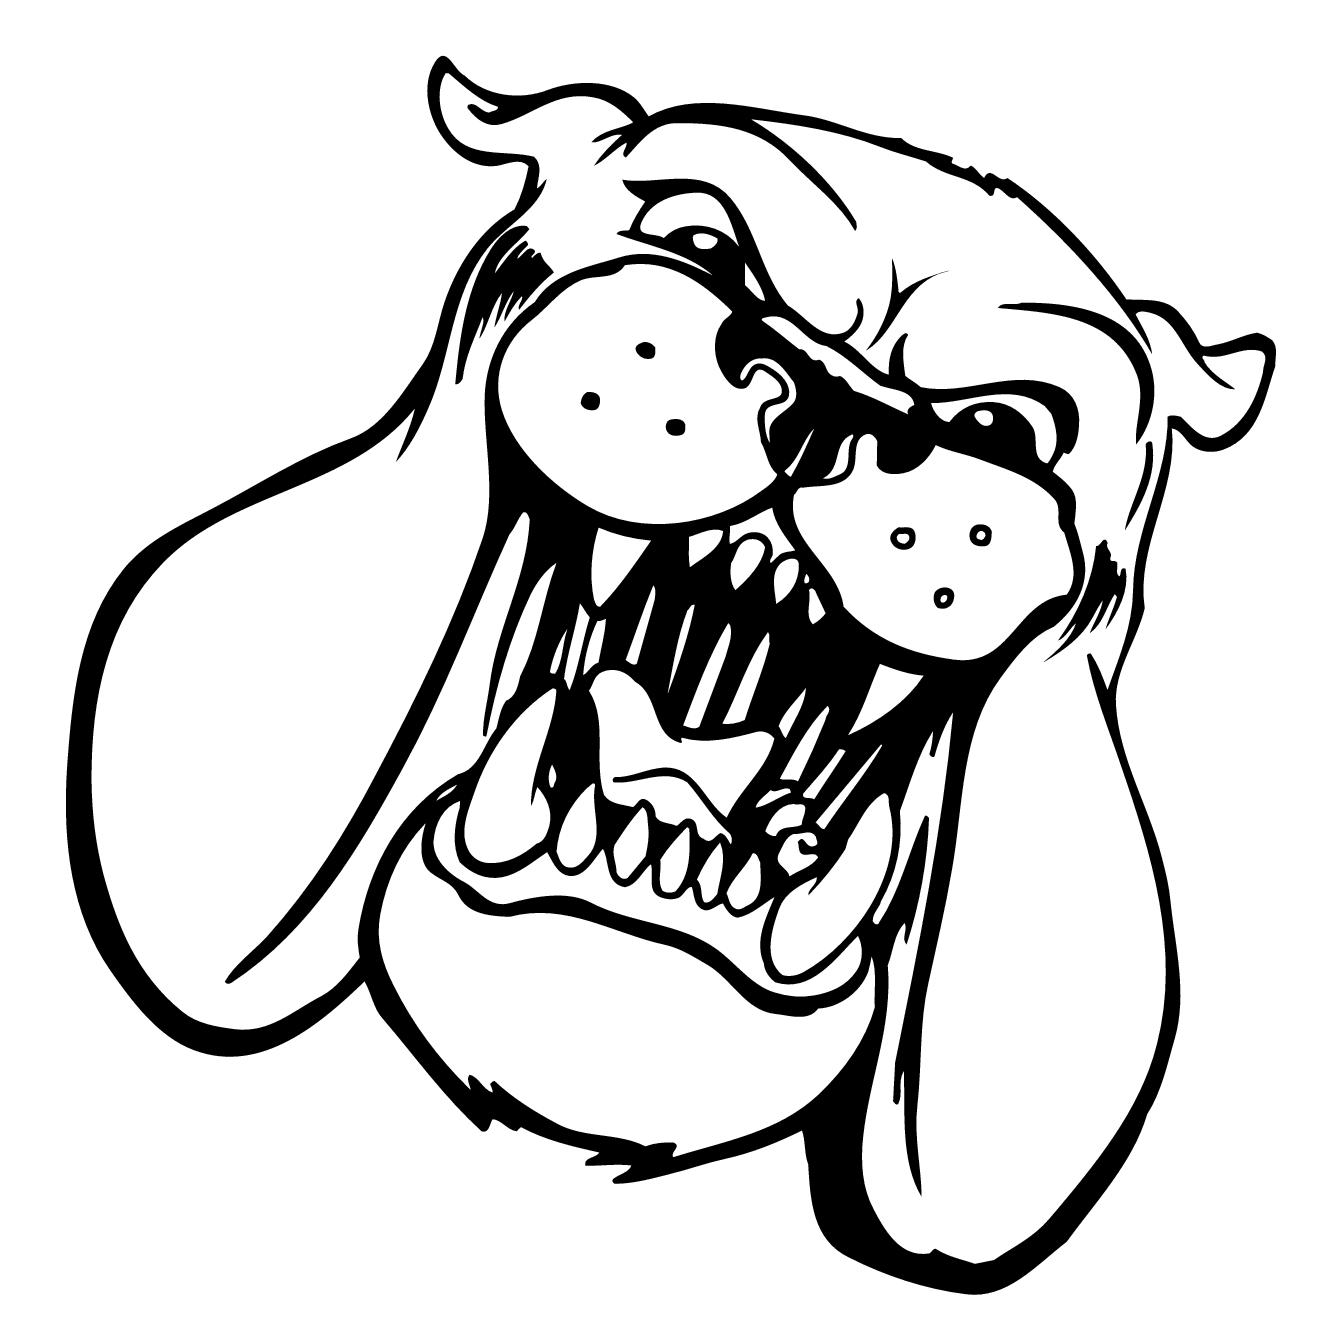 Bulldog Mascot Clipart Free Download Best Bulldog Mascot Clipart